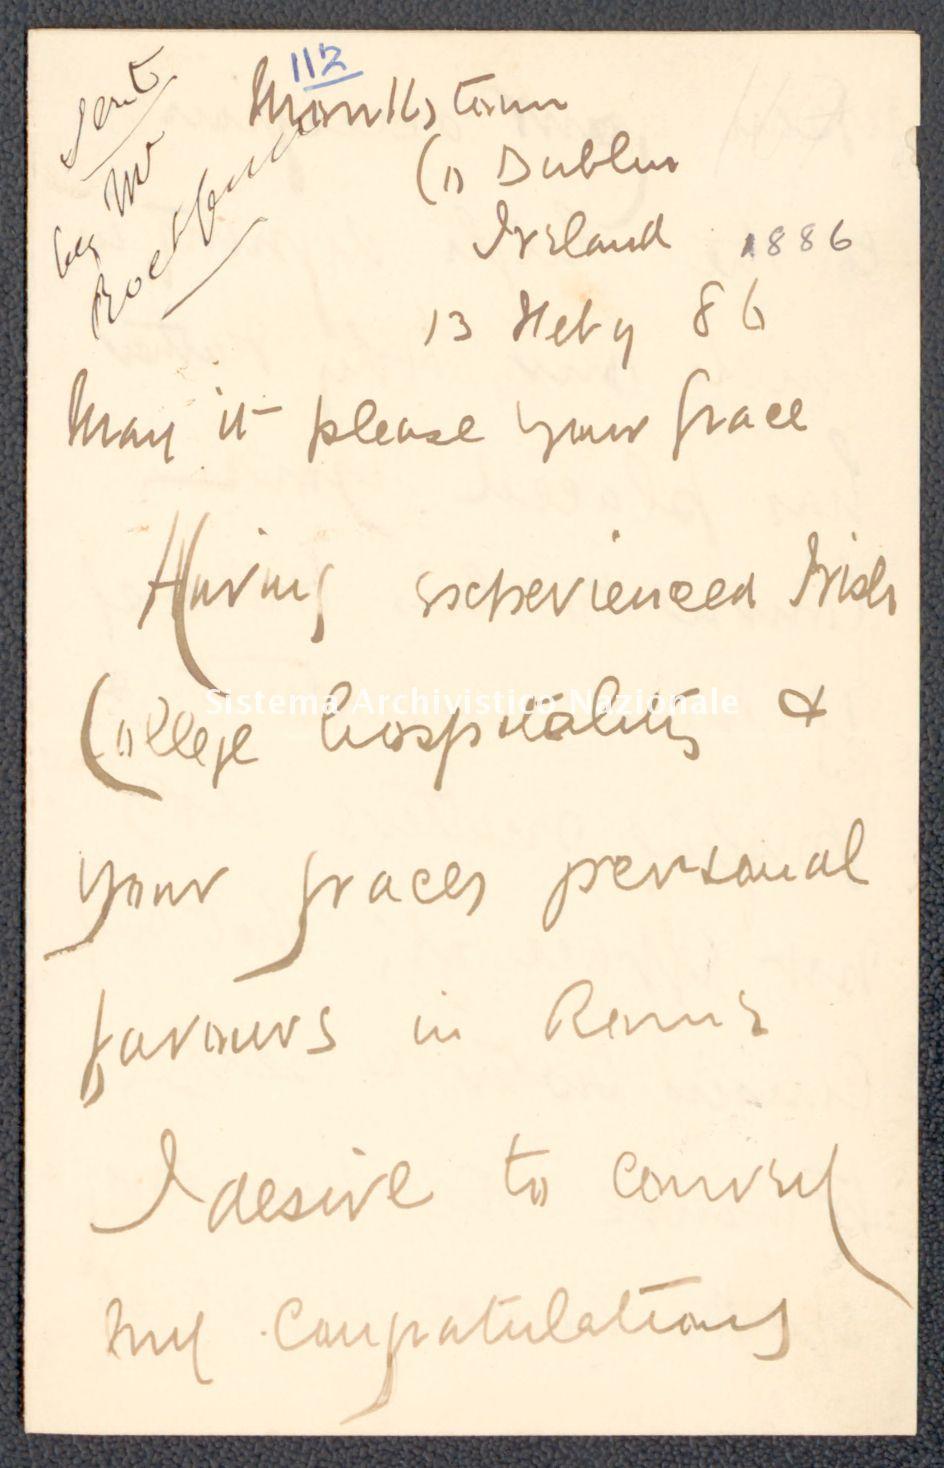 Pontificio Collegio Irlandese - Kirby_1886_112